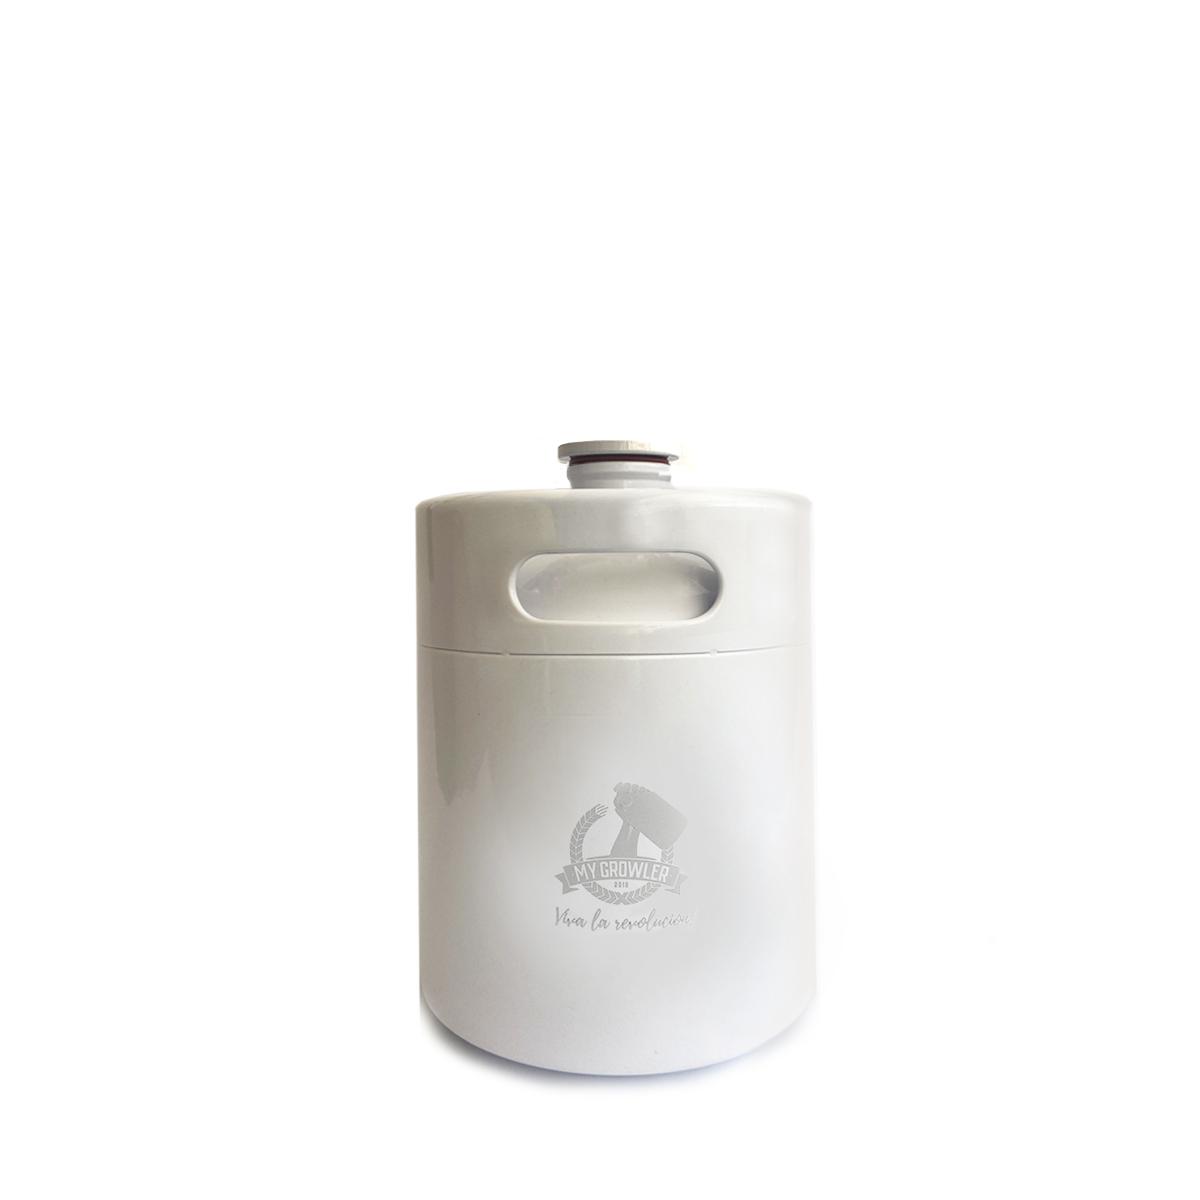 Kit My Keg: Chopeira 2L branco com torneira americana standard